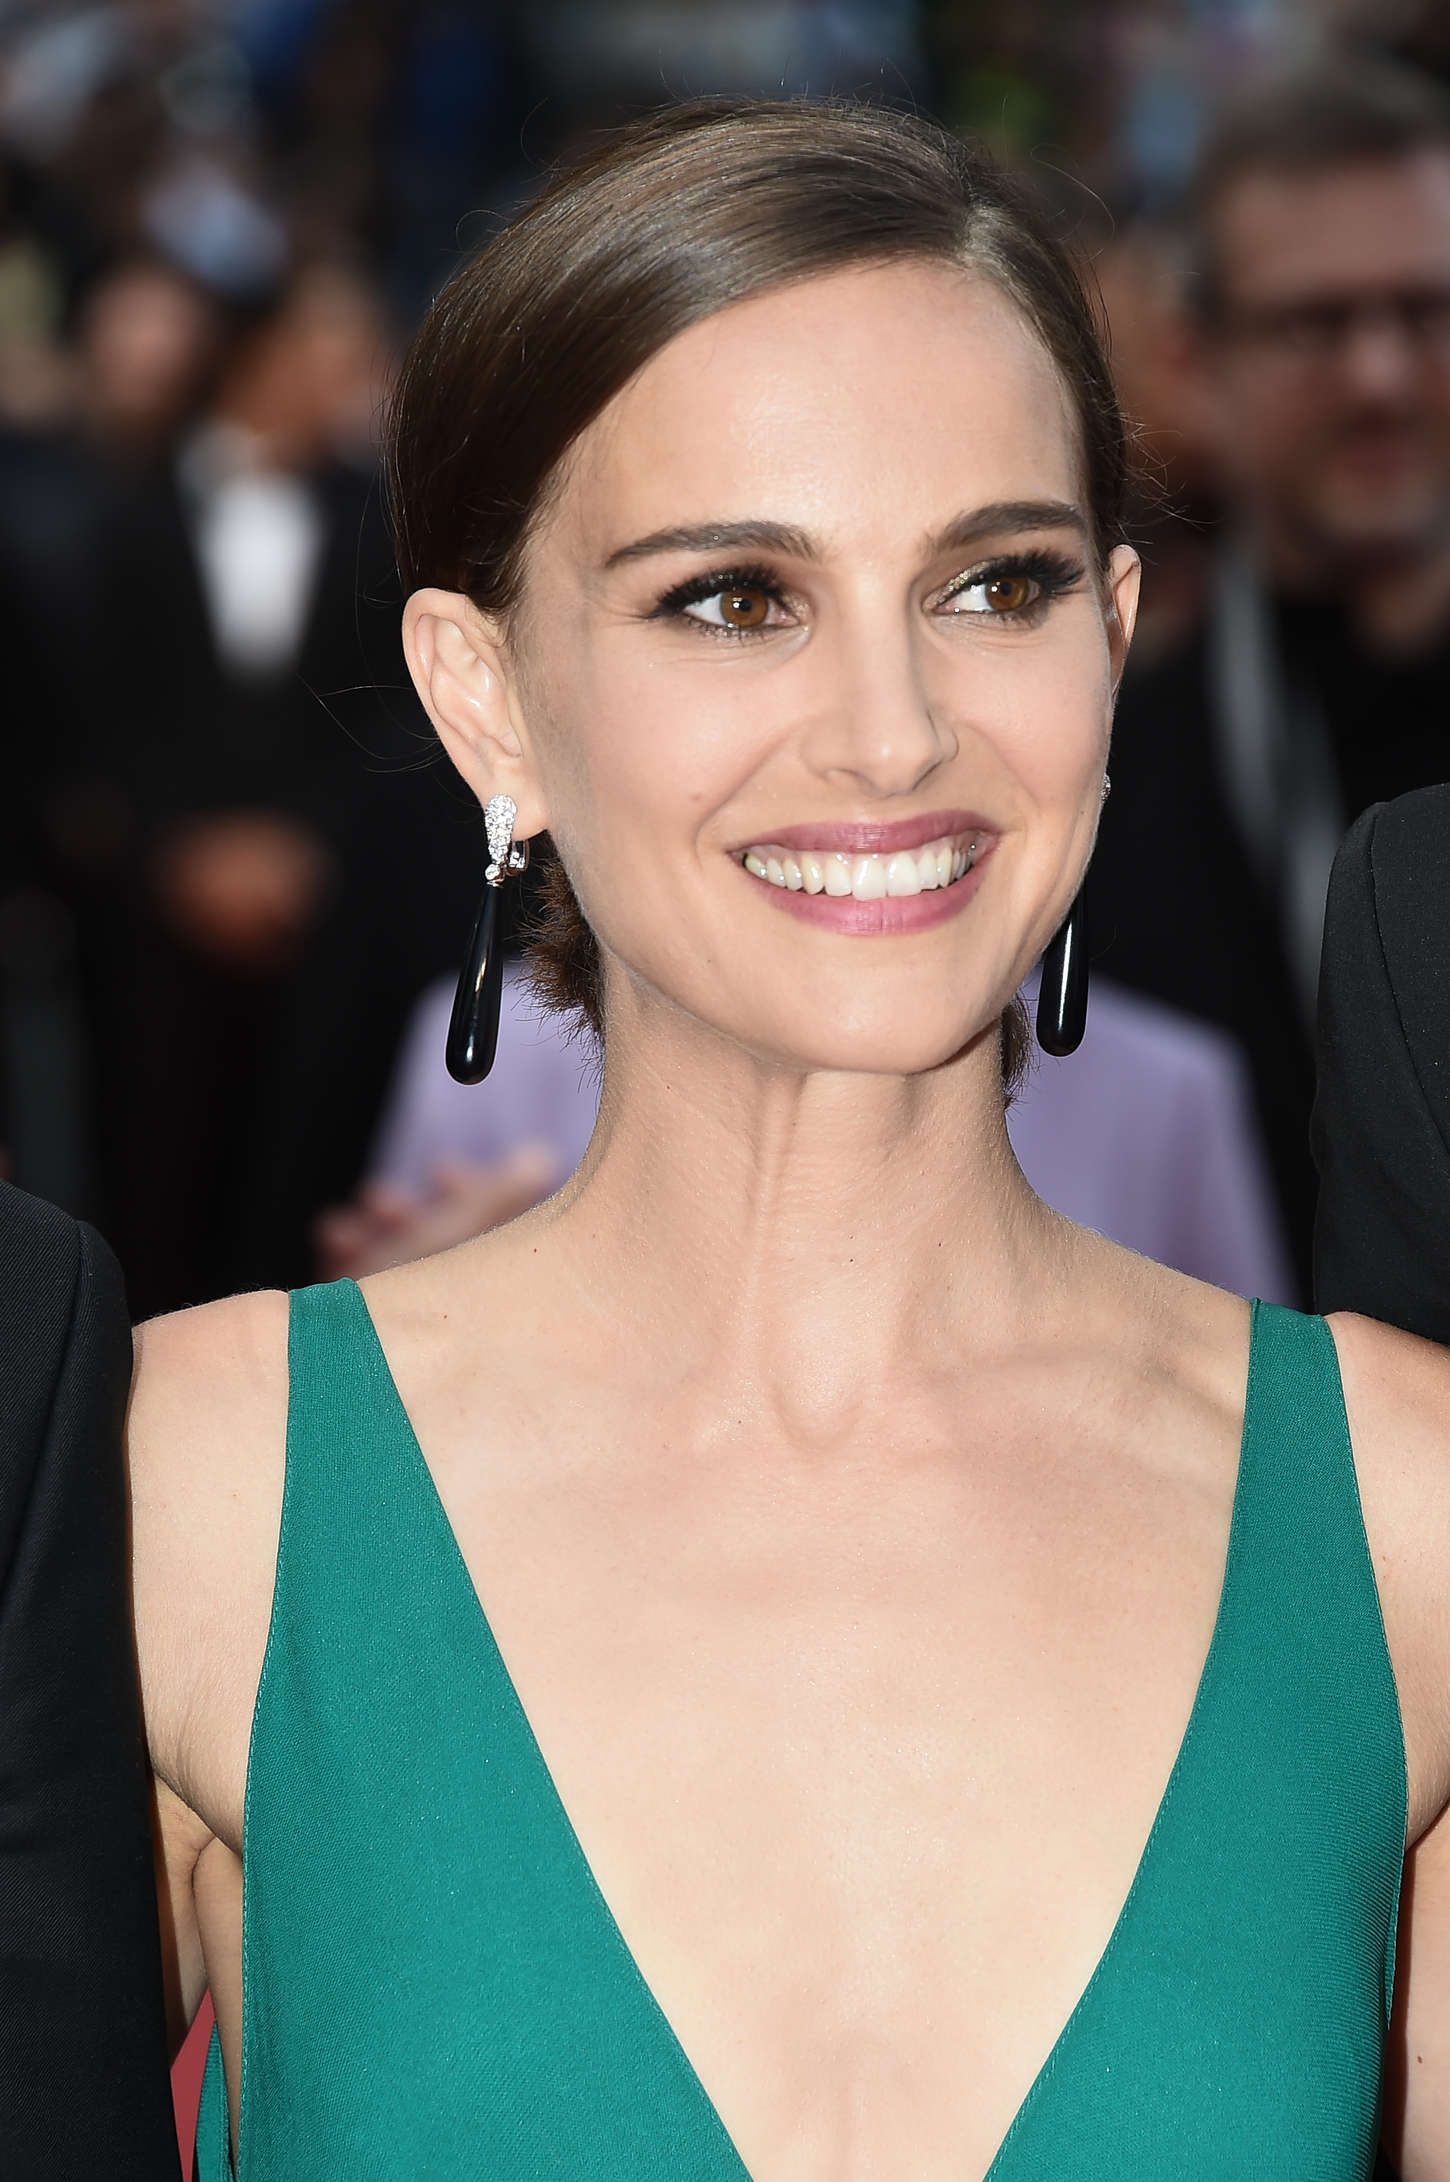 Natalie Portman 2015 : Natalie Portman: Sicario Premiere -02